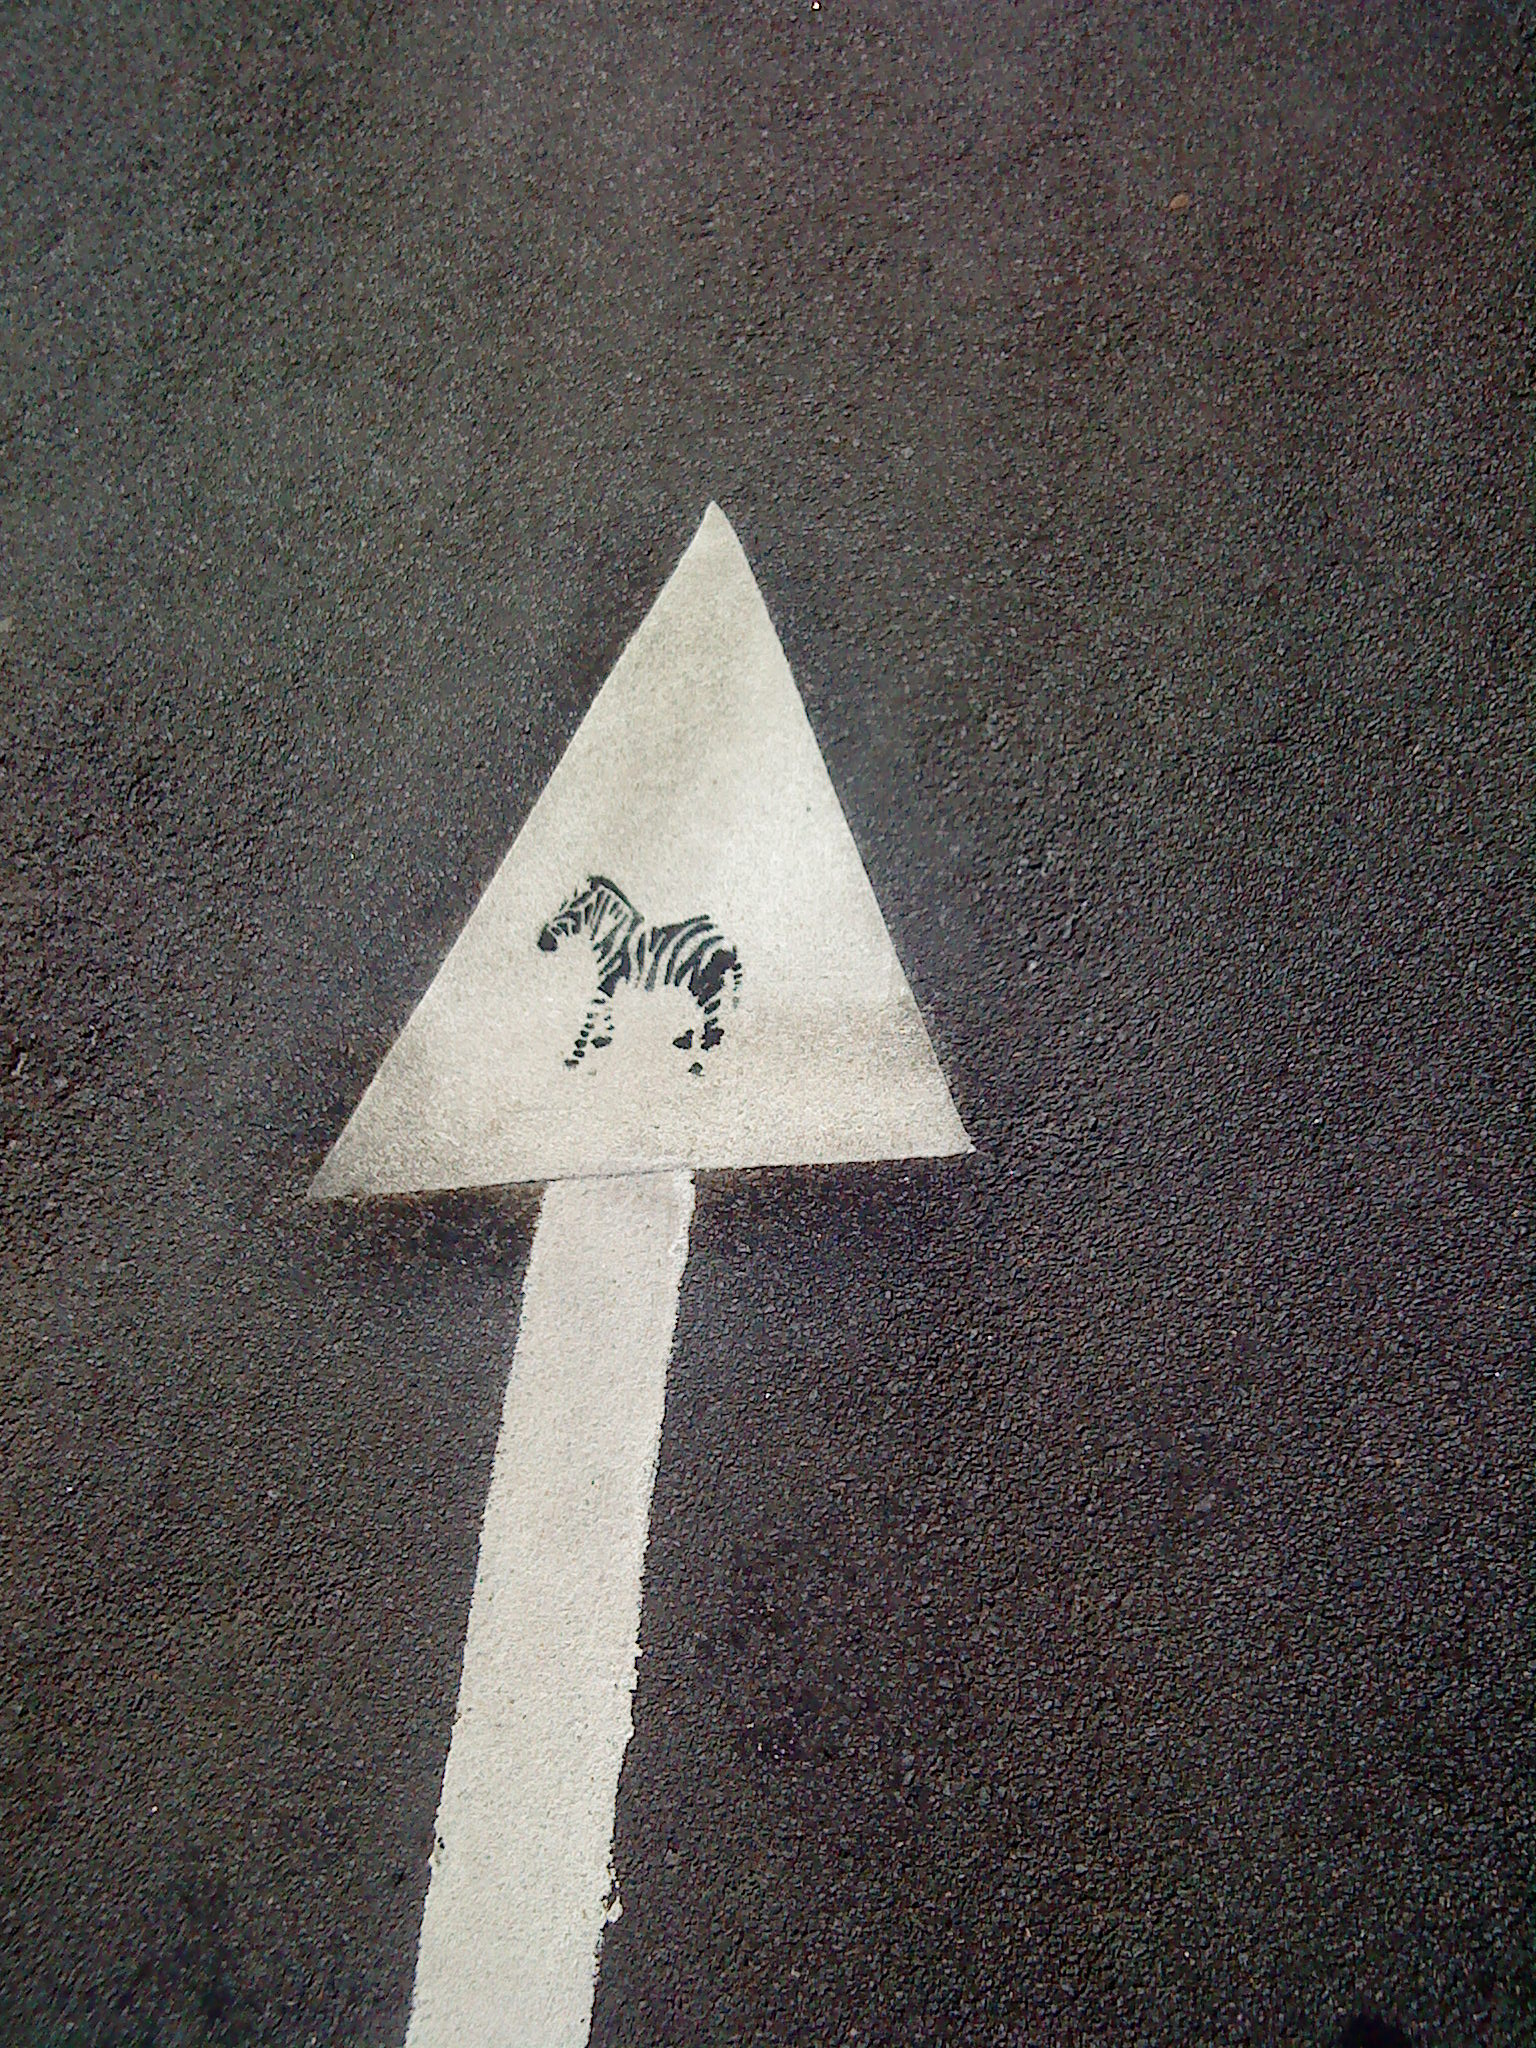 Streetart - Zebra